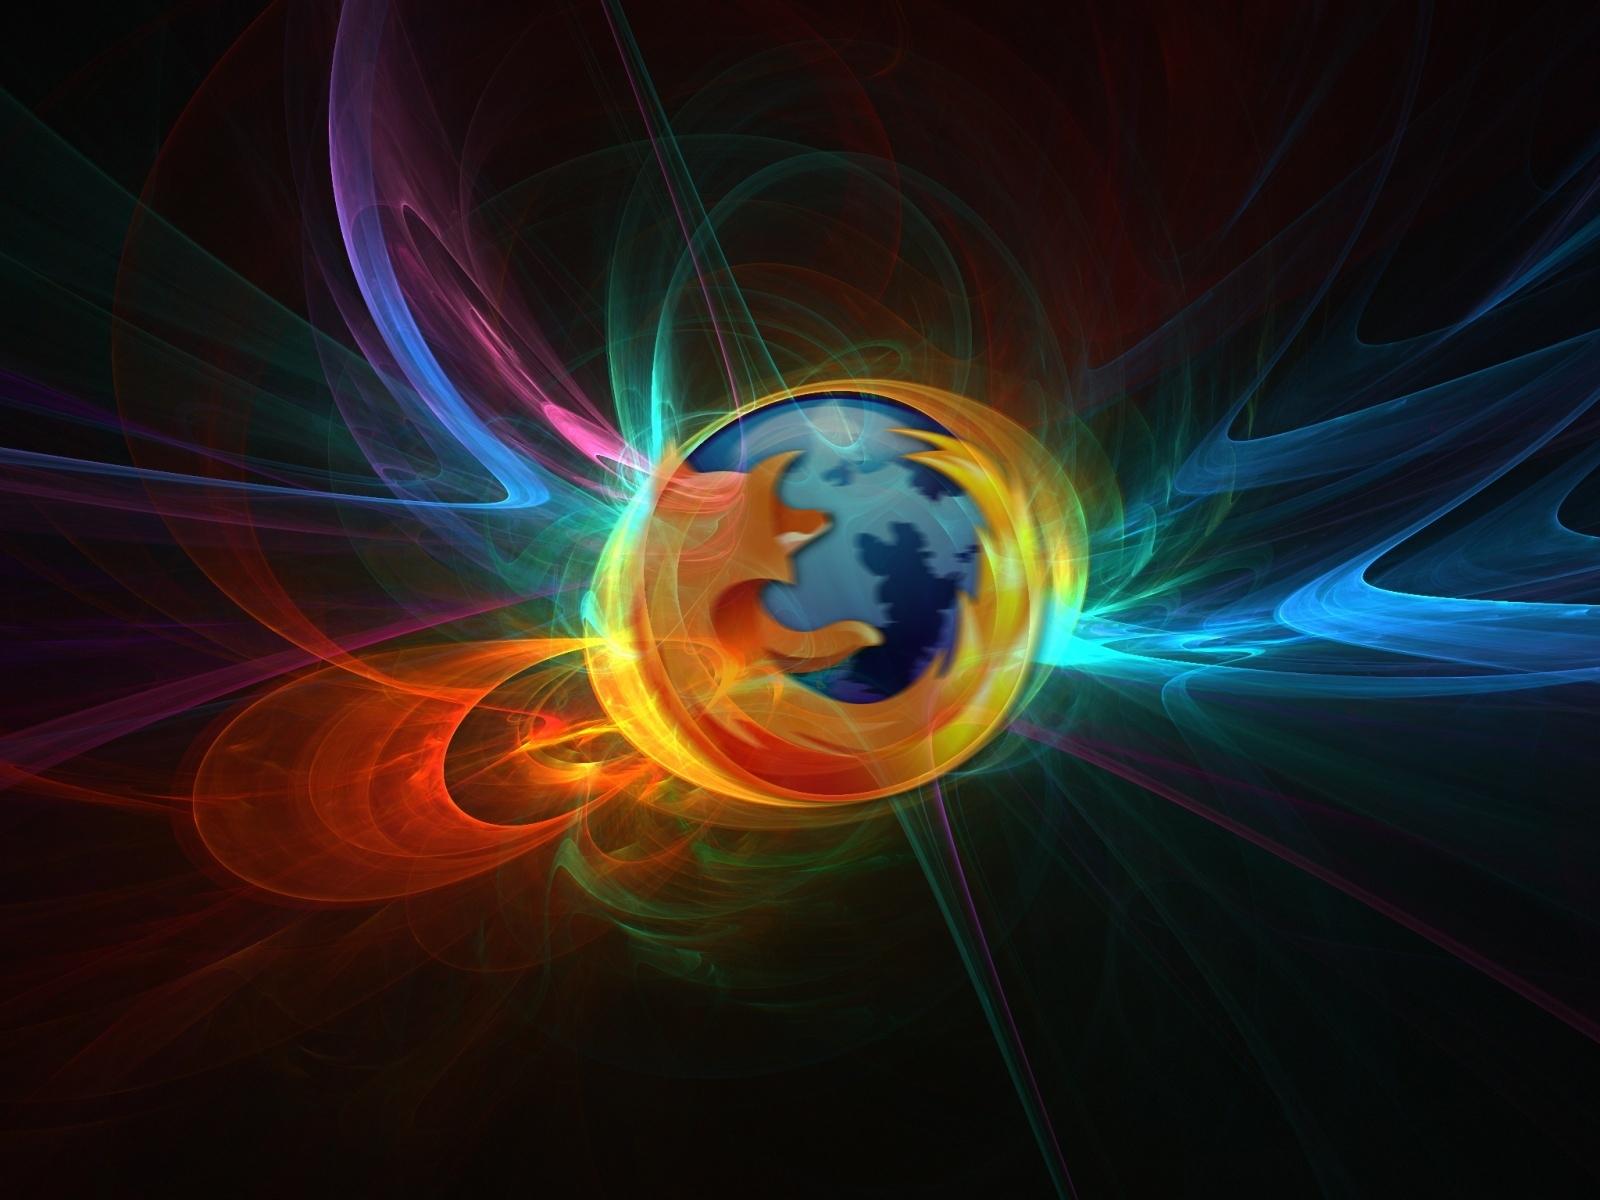 Firefox Firefox 1600x1200